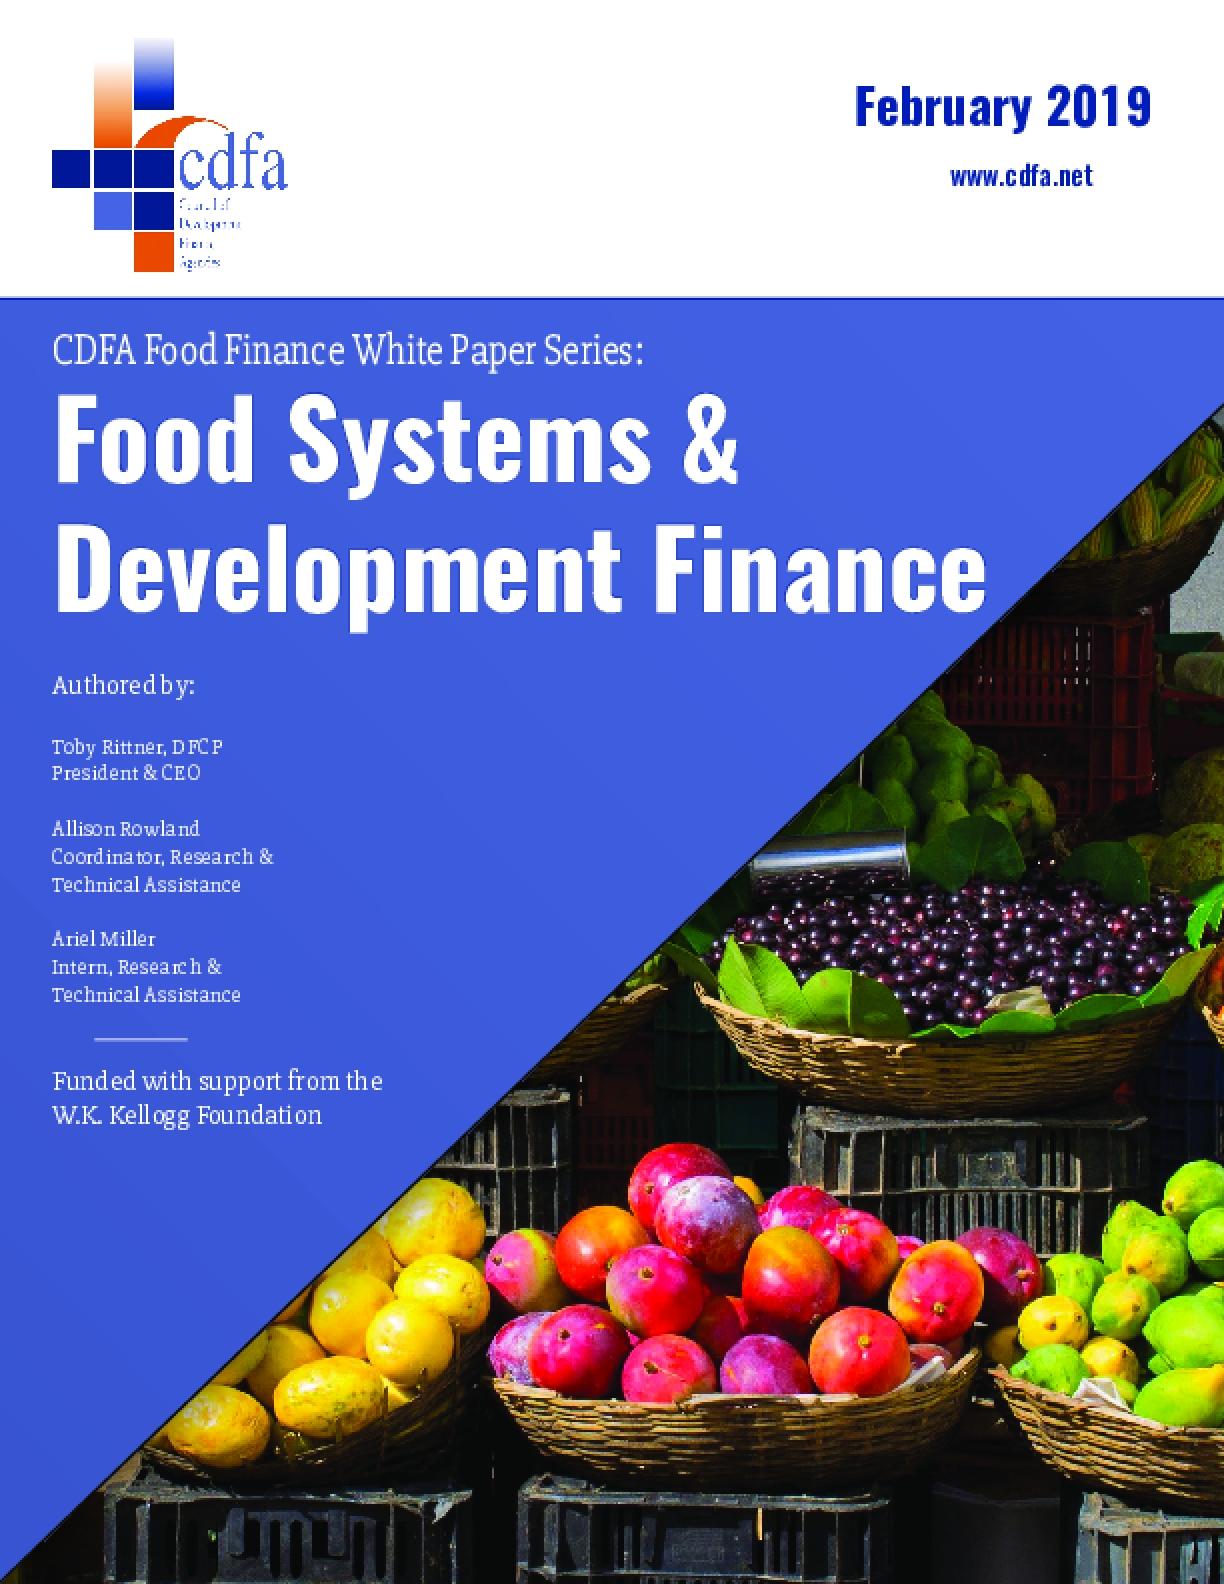 Food Systems & Development Finance